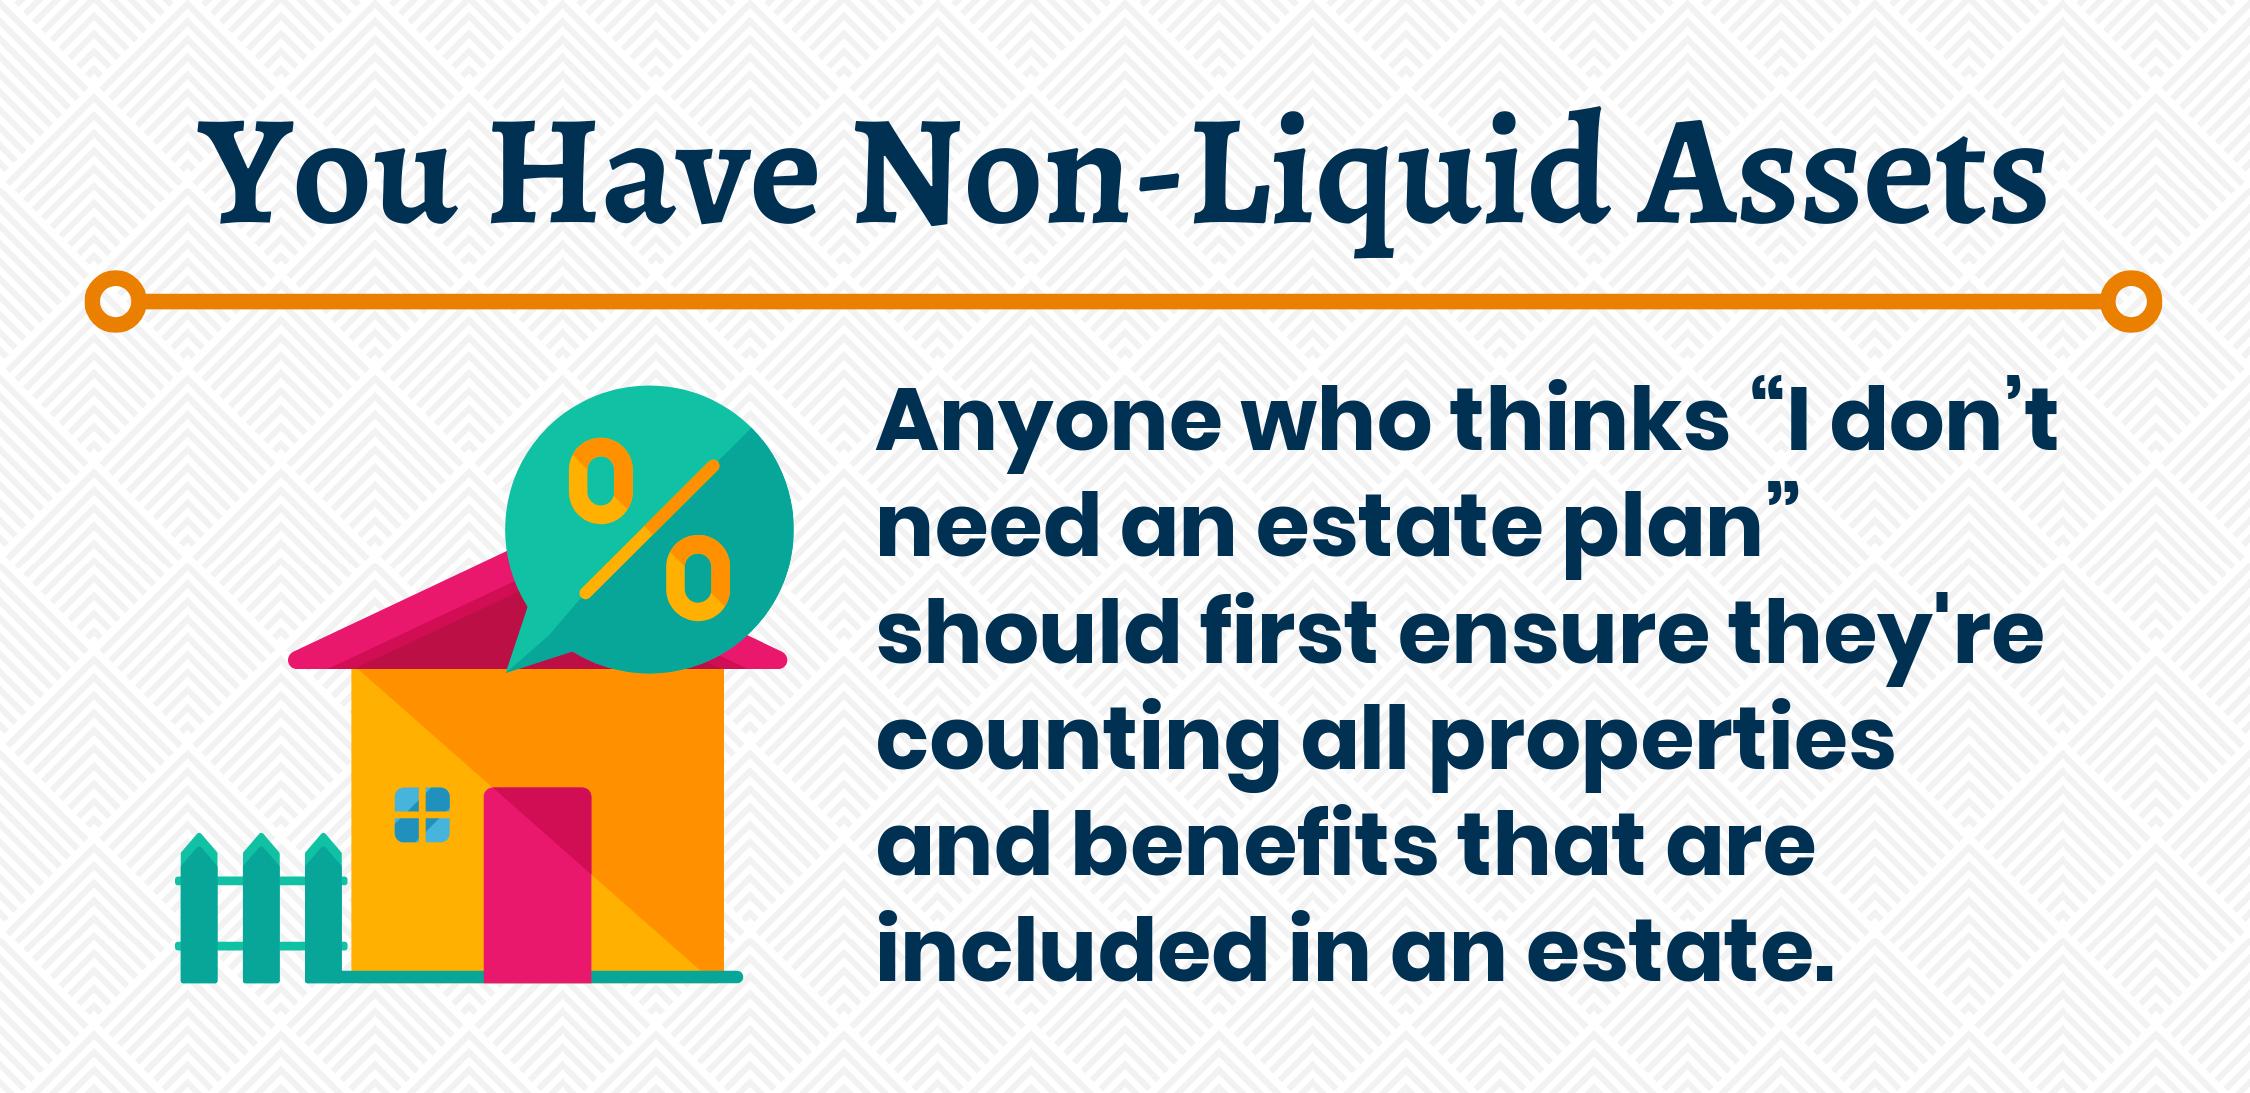 You Have Non-Liquid Assets